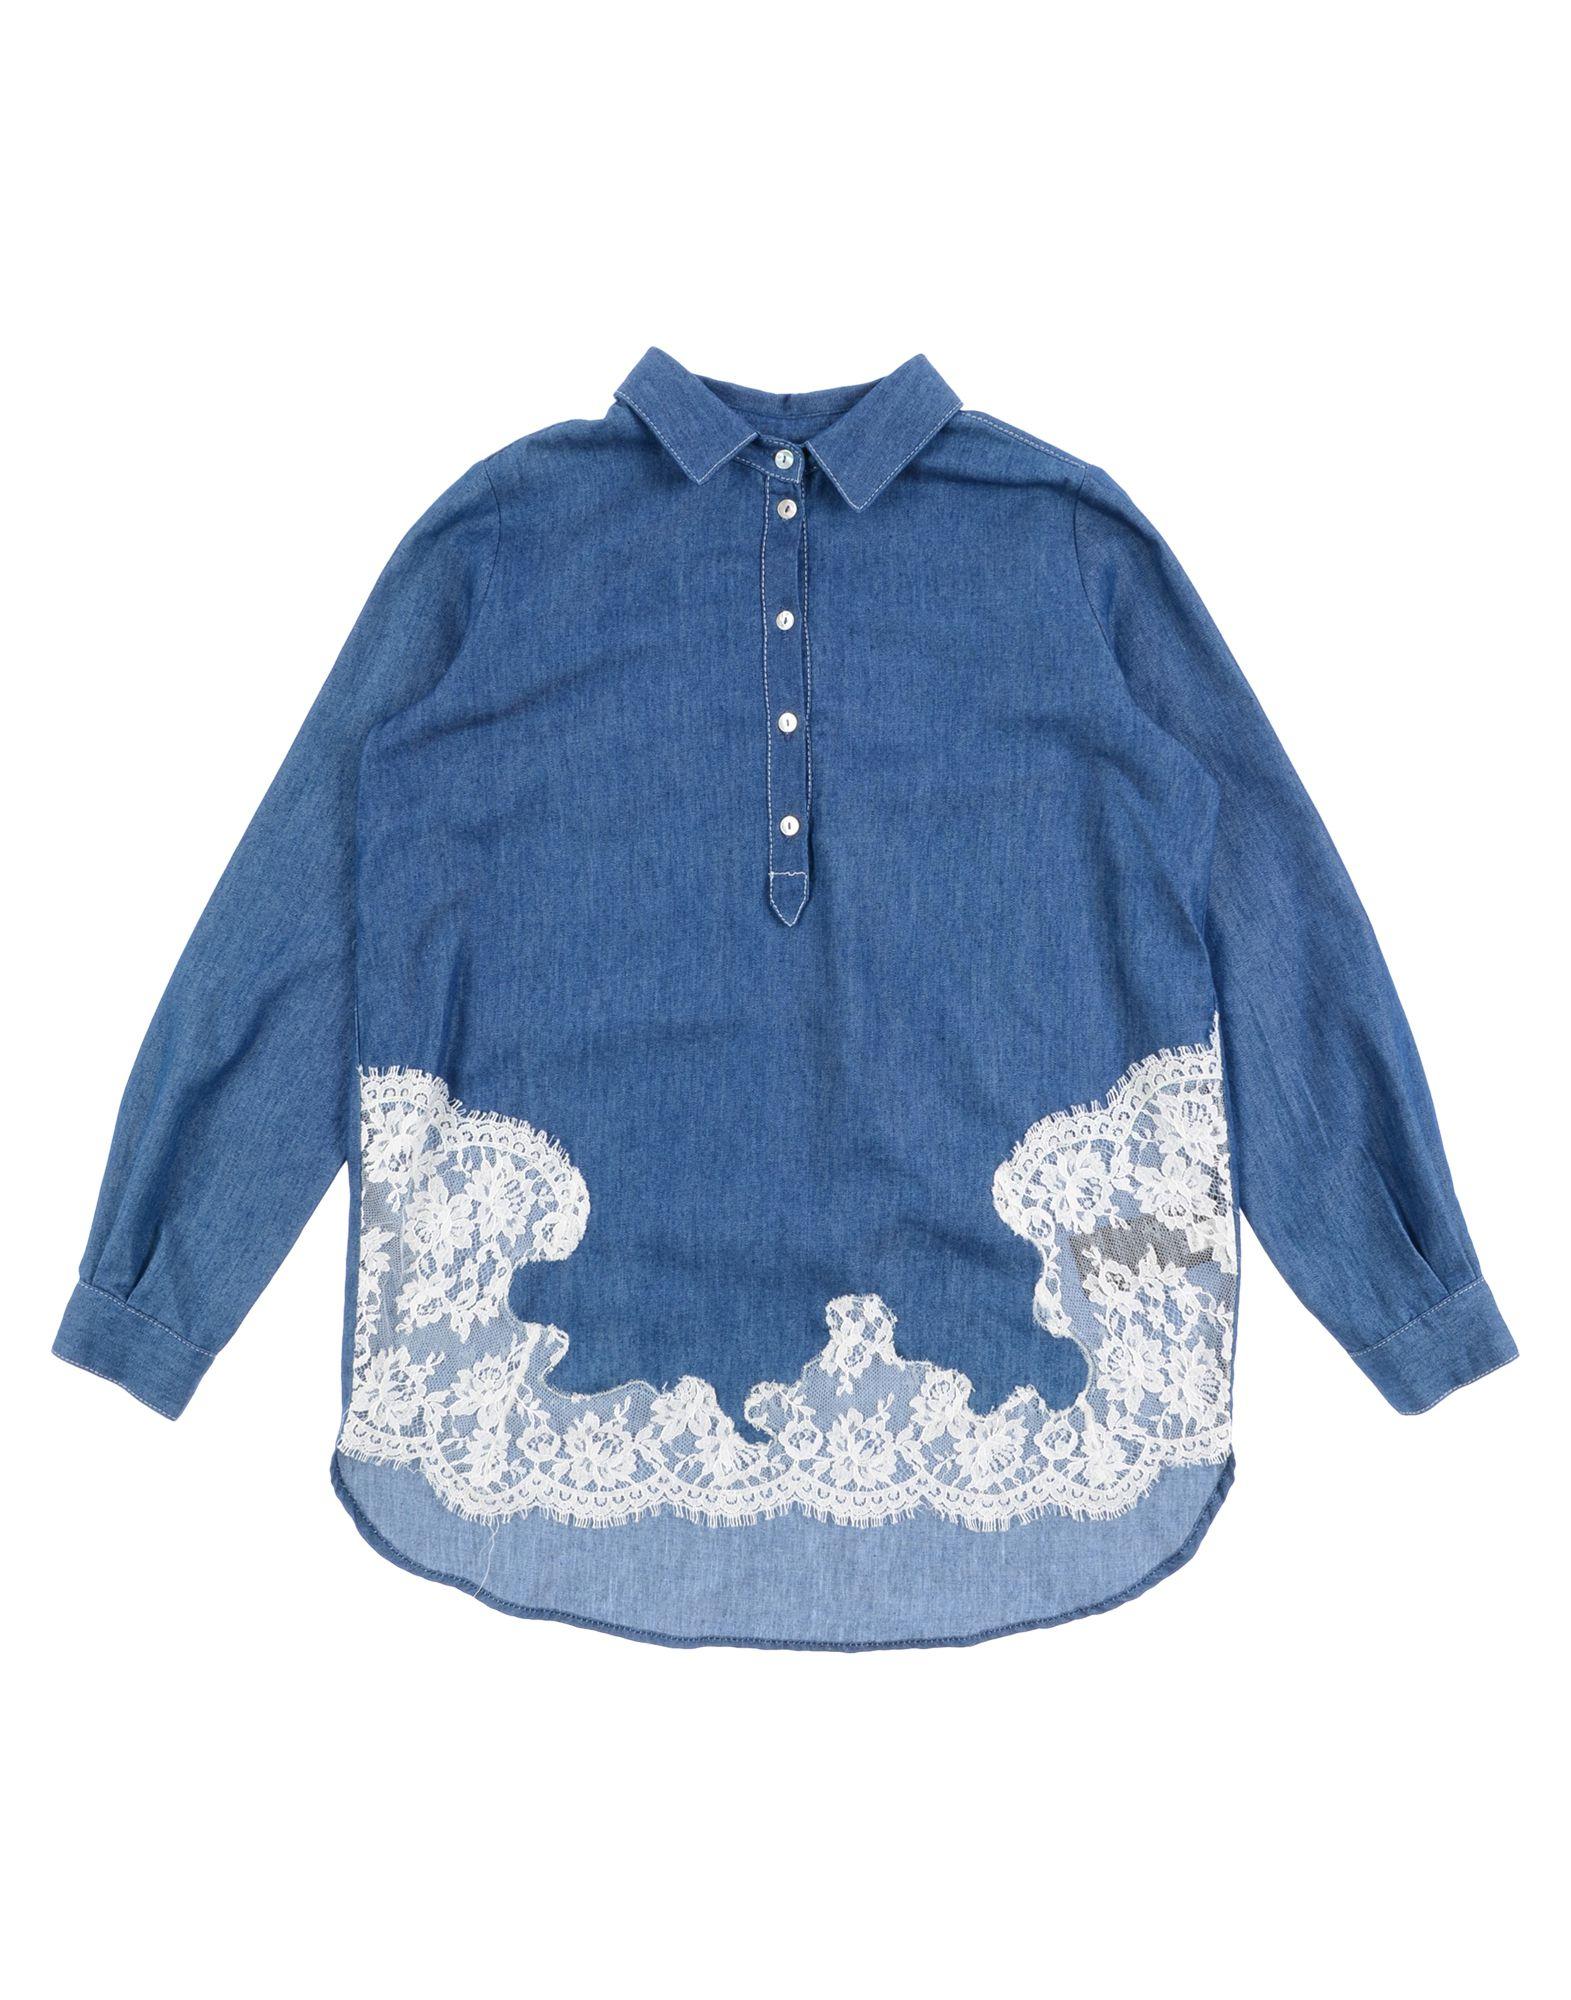 ERMANNO SCERVINO JUNIOR Джинсовая рубашка цена и фото